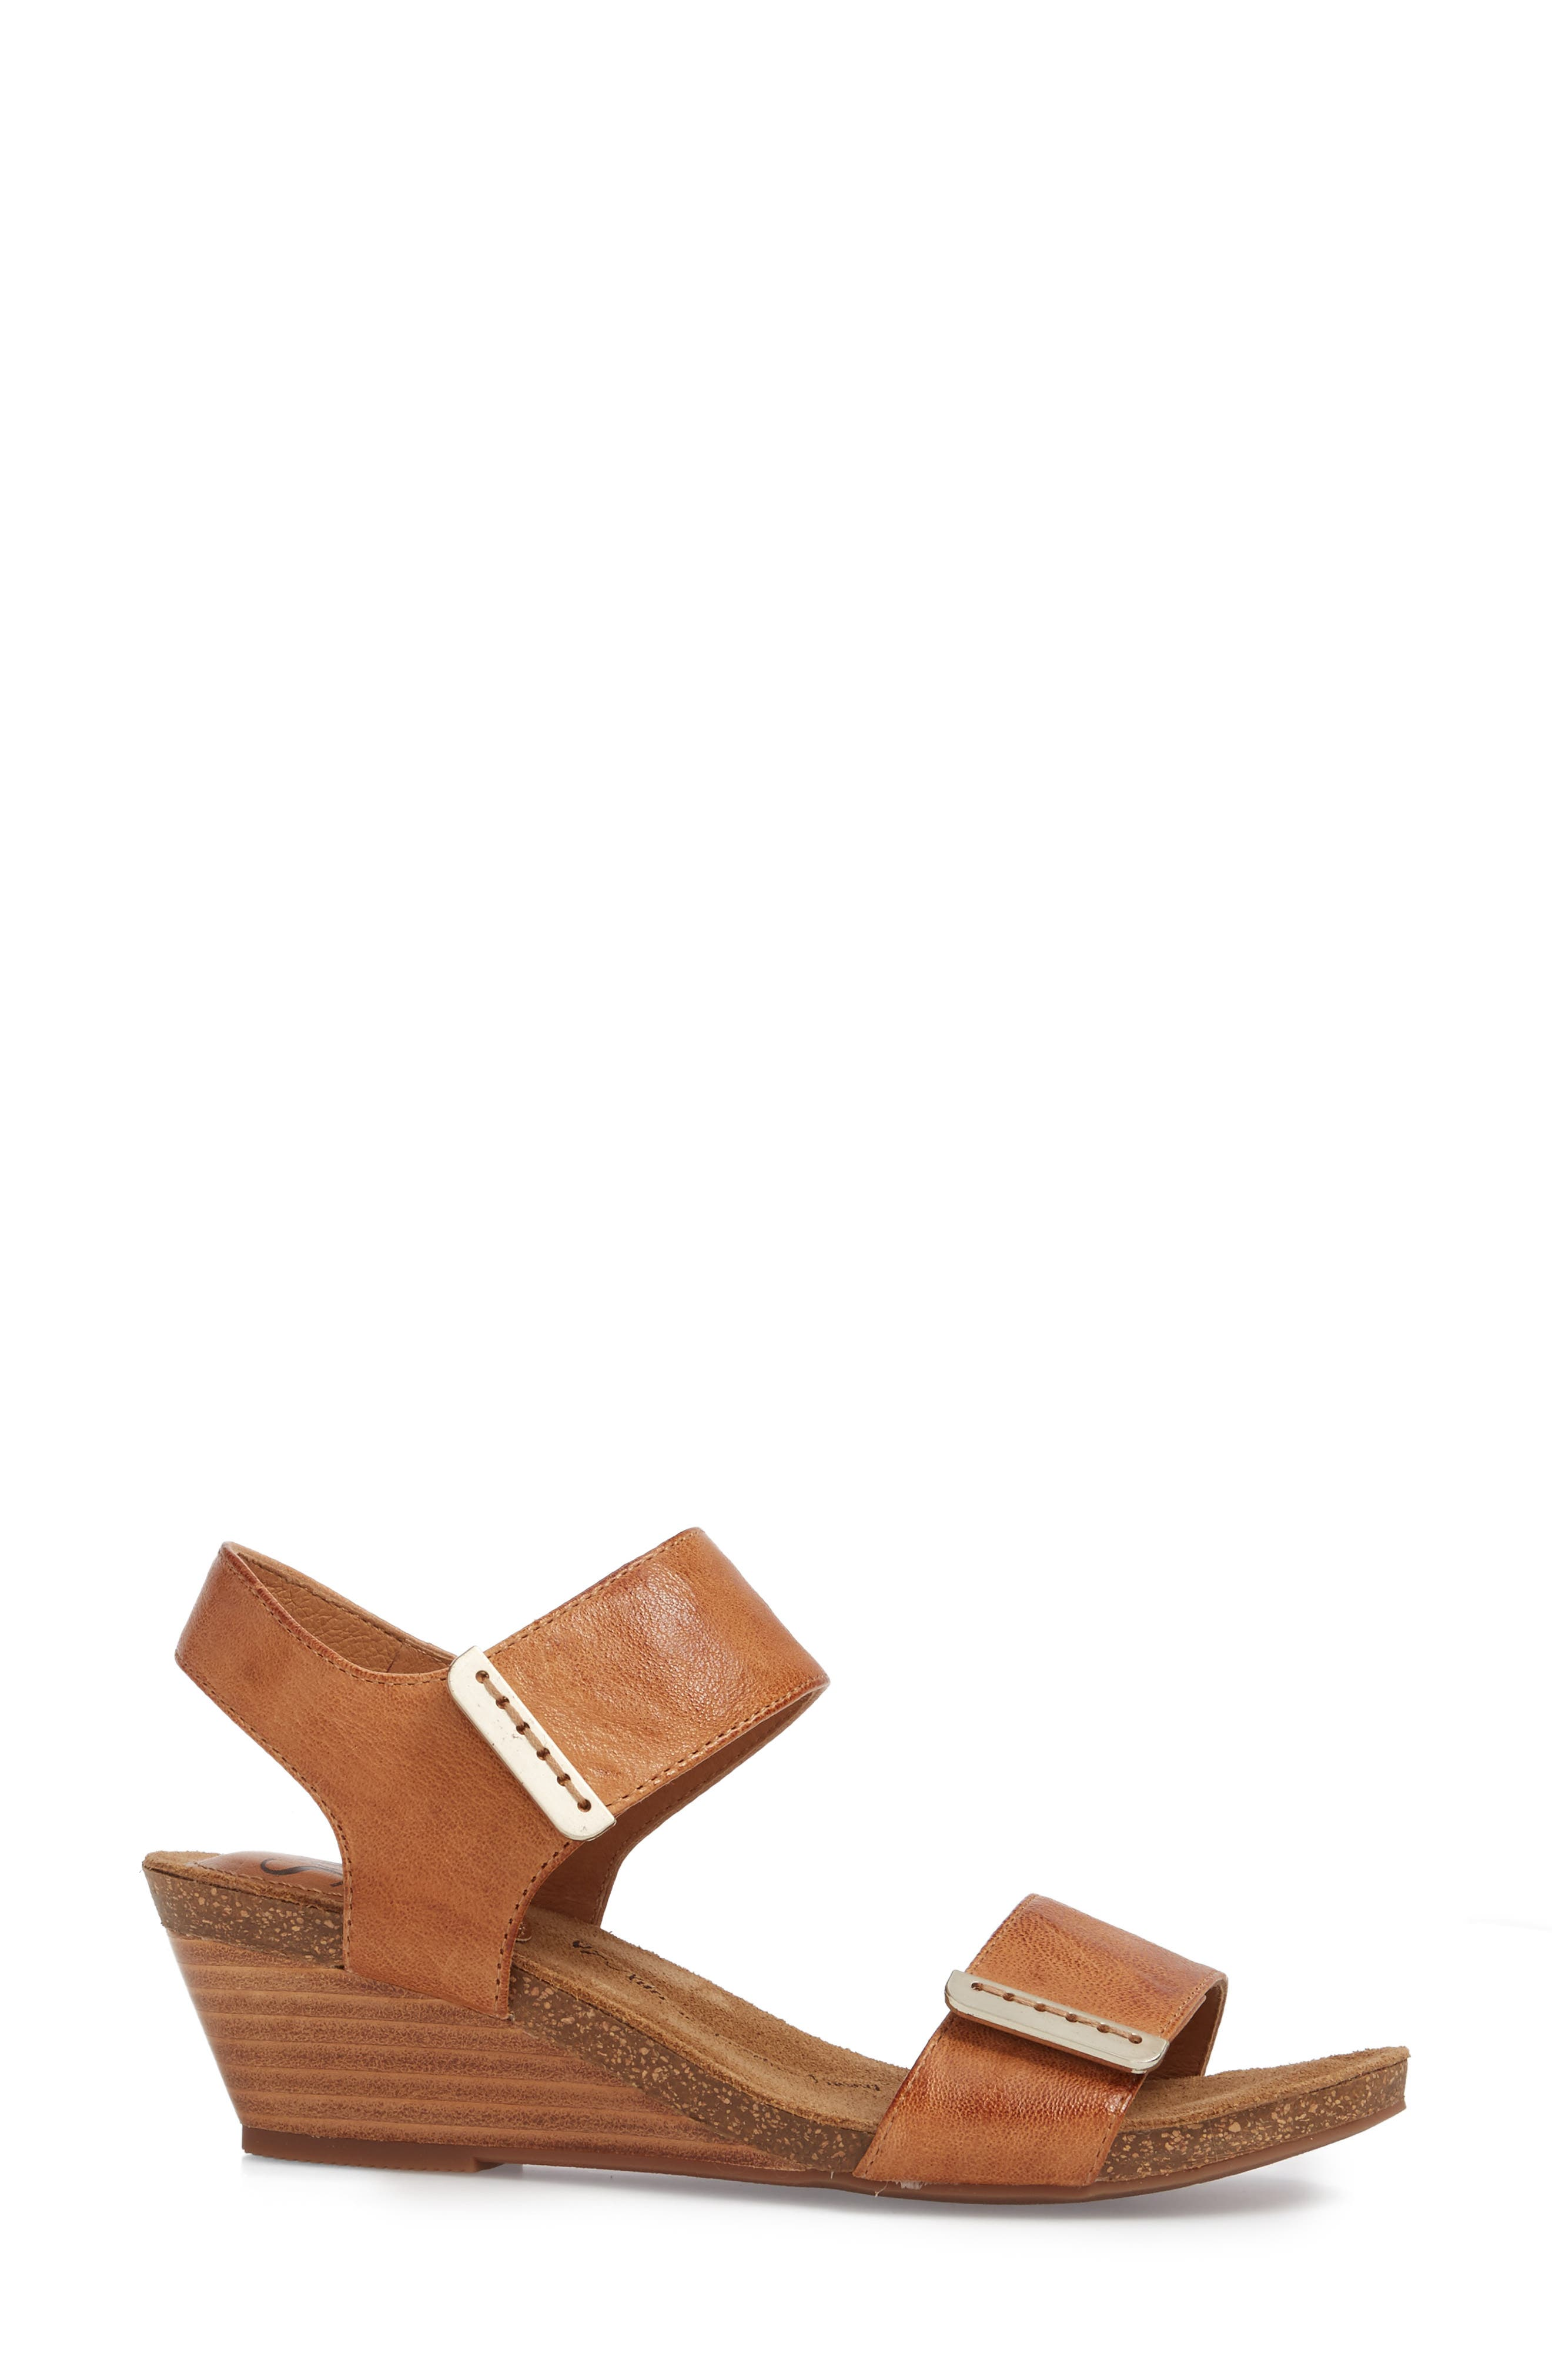 Verdi Wedge Sandal,                             Alternate thumbnail 3, color,                             Luggage Leather